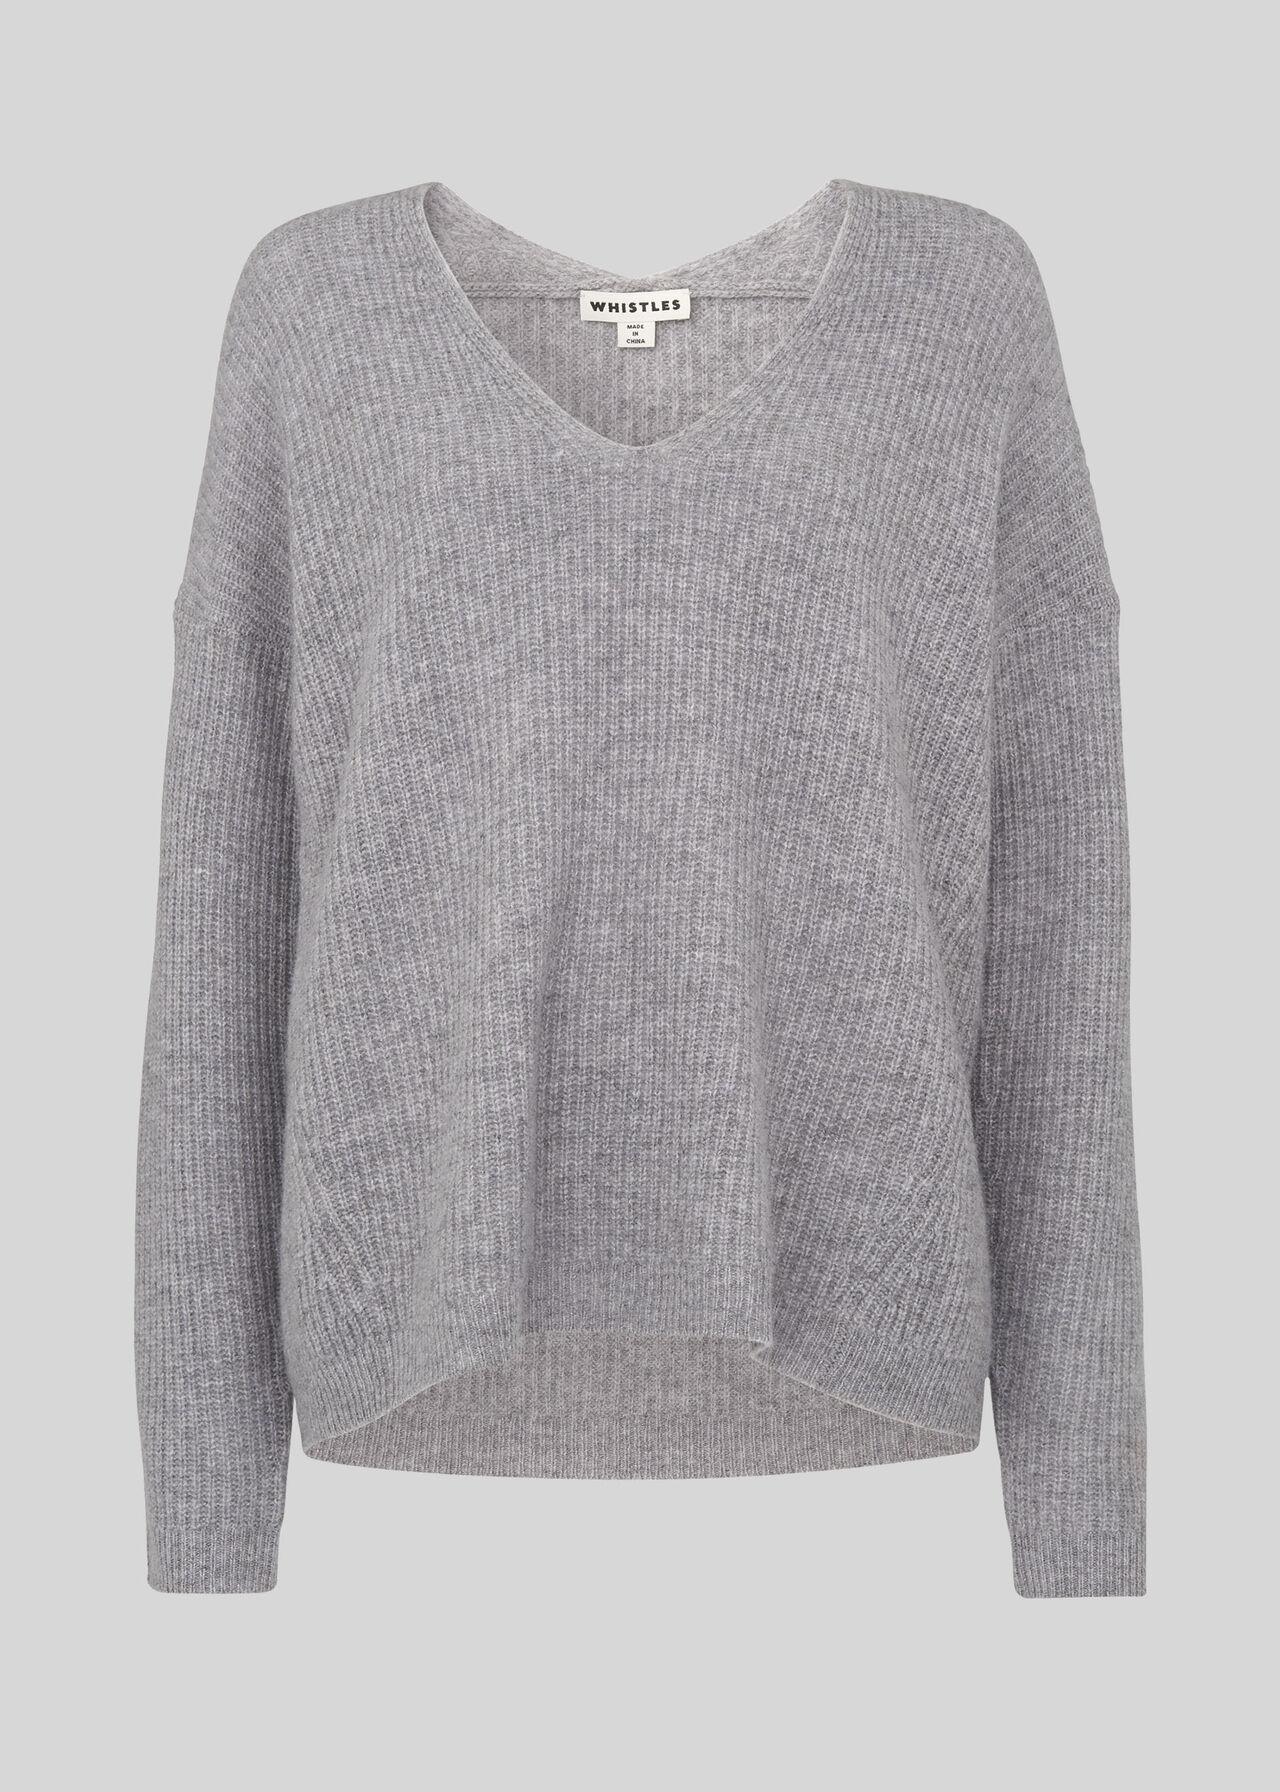 Grey V Neck Rib Wool Sweater Whistles Whistles